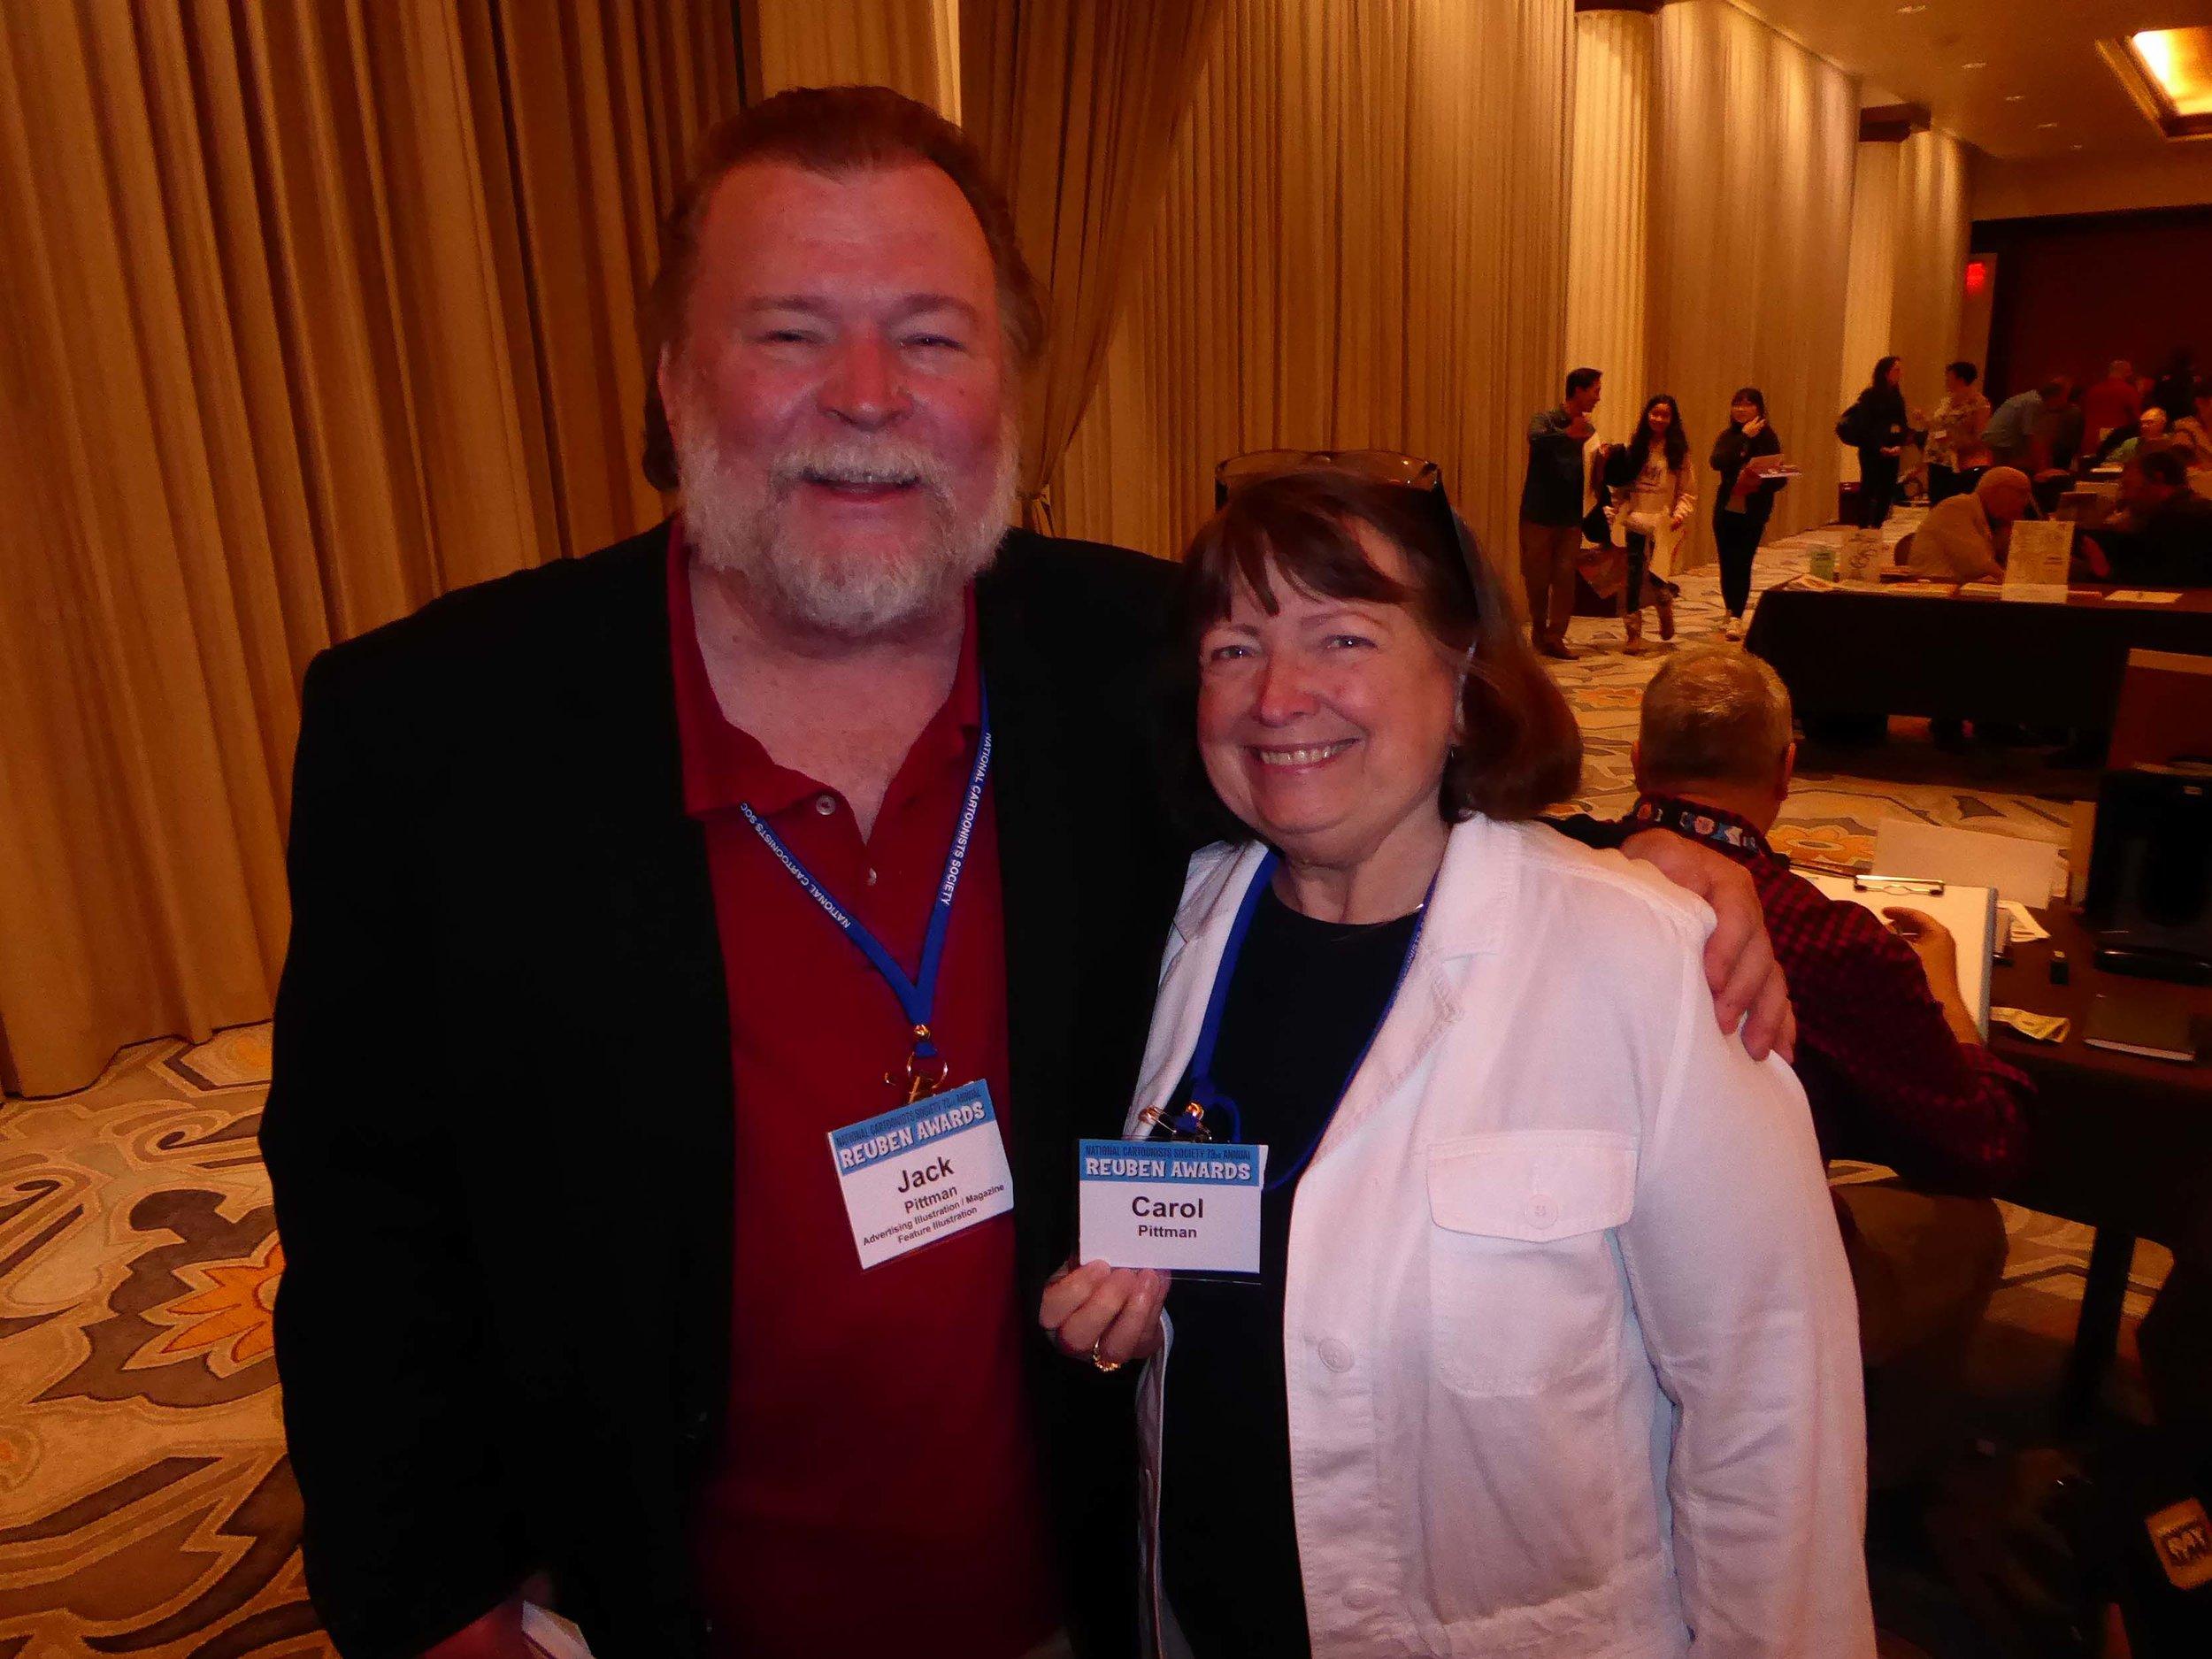 Jack and Carol Pittman